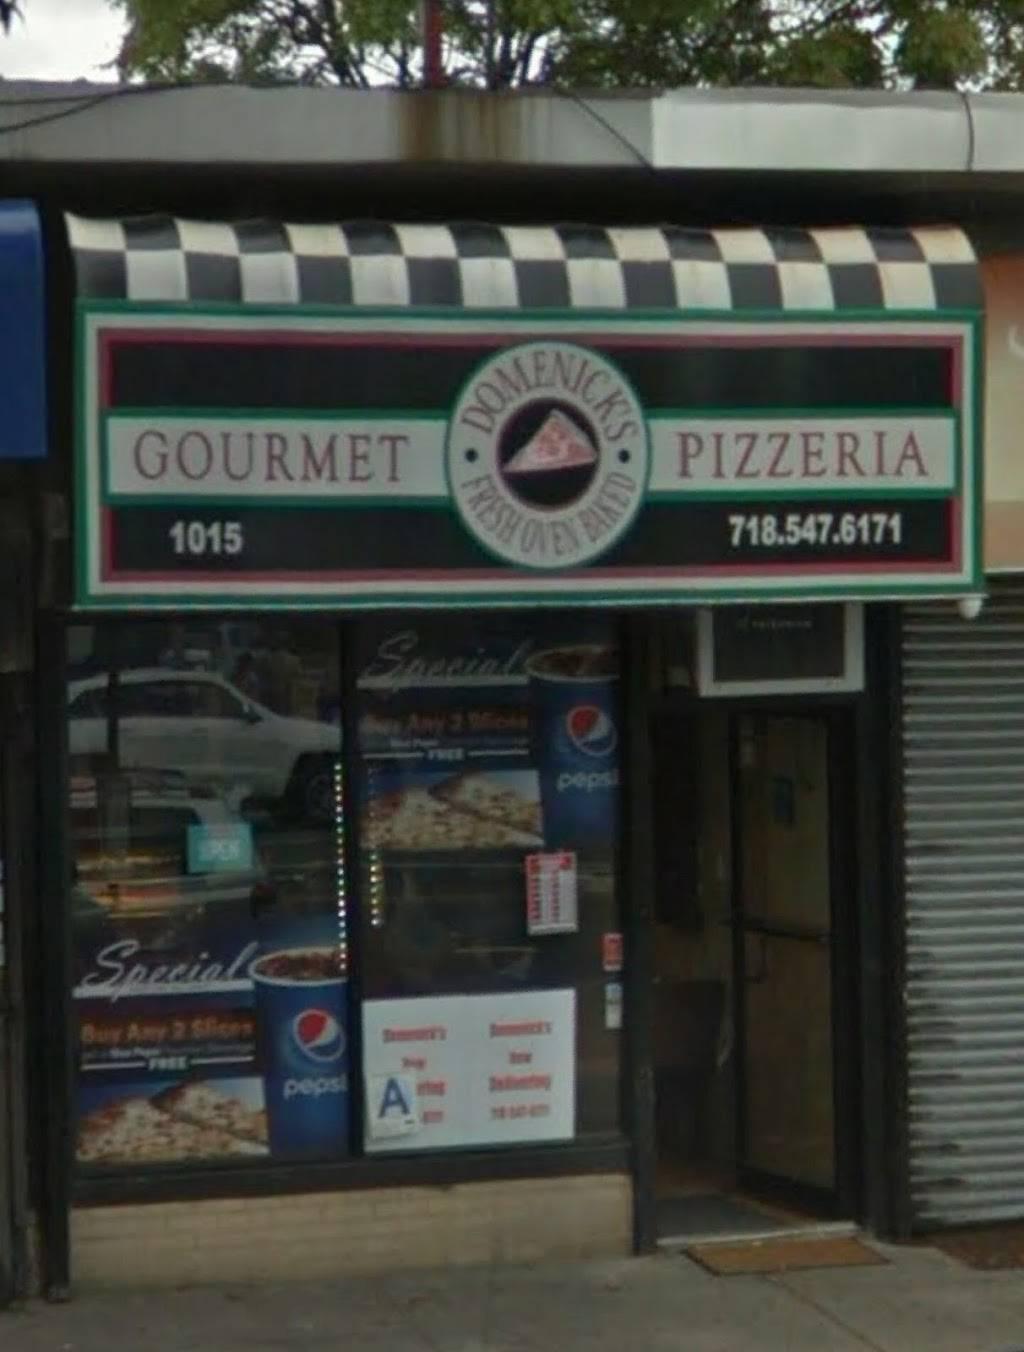 Domenicks Pizzeria   restaurant   1015 Allerton Ave, Bronx, NY 10469, USA   7185476171 OR +1 718-547-6171